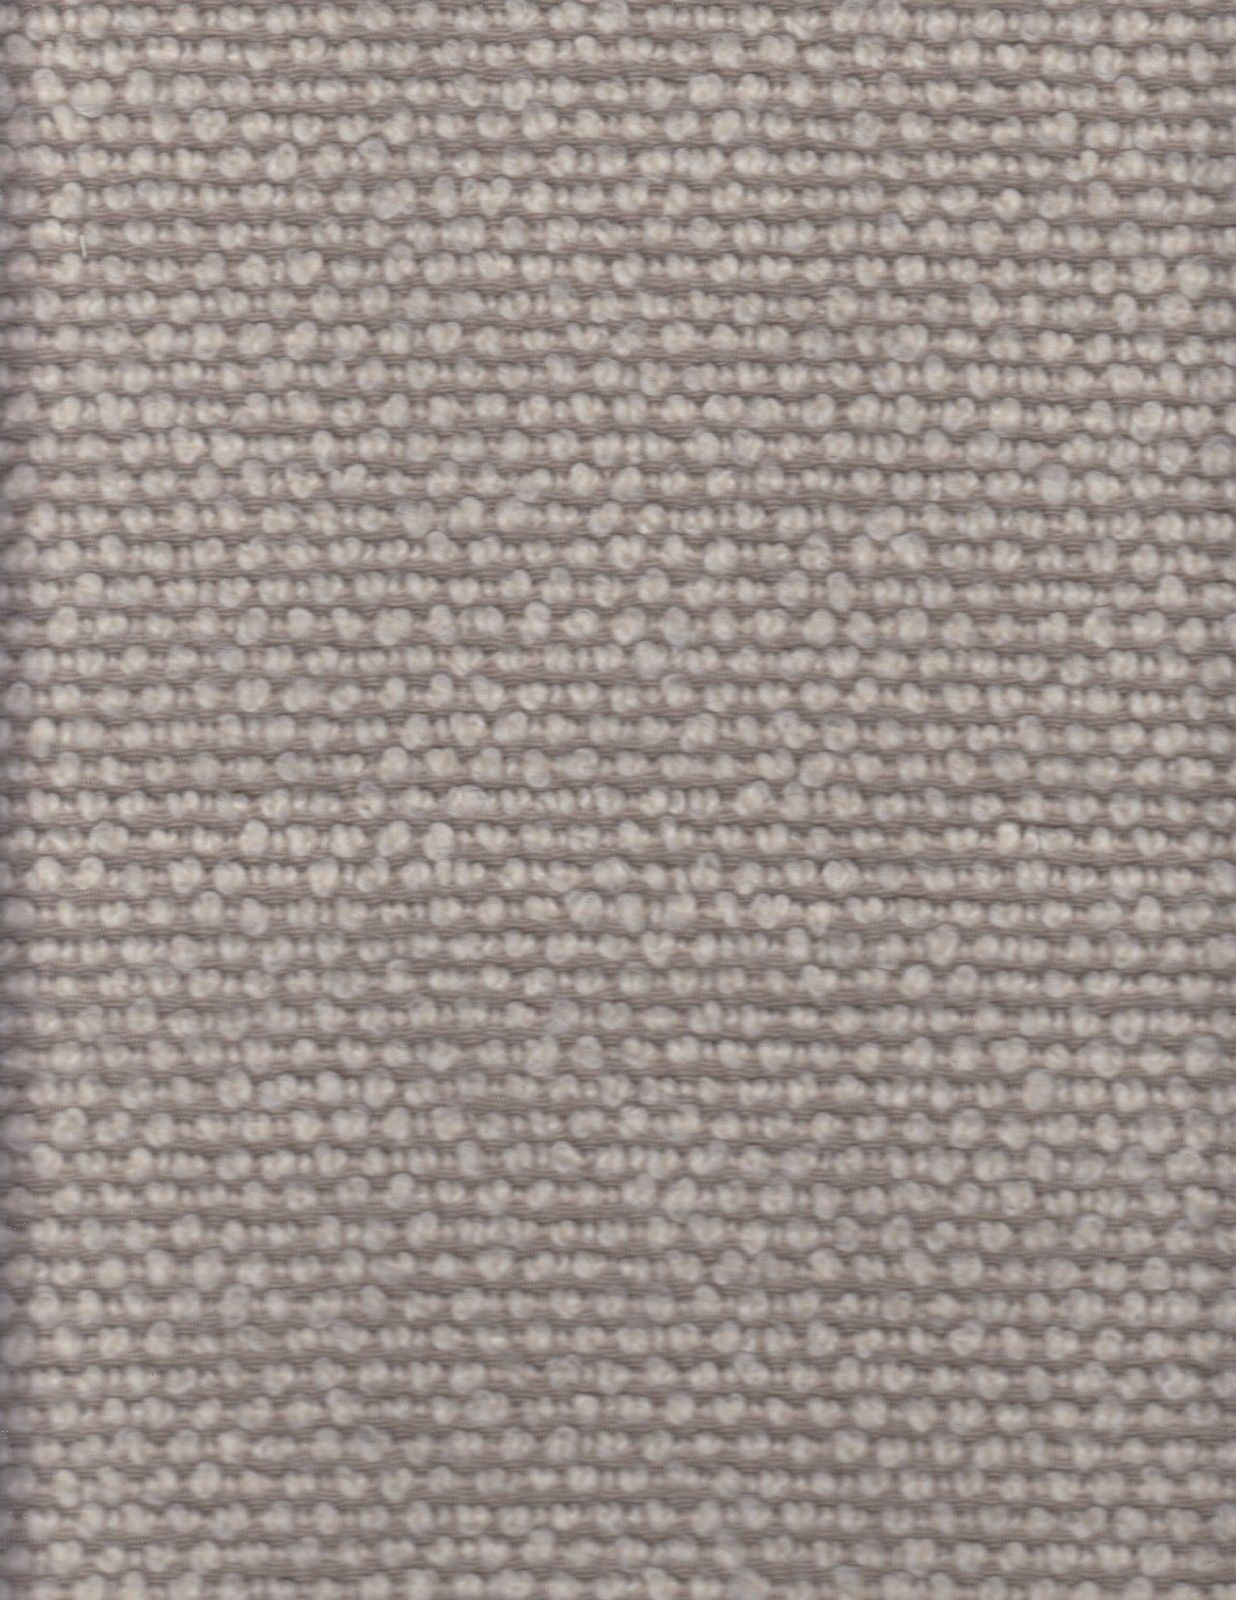 8.875 yds Bernhardt Upholstery Fabric MCM Muse Nubby Wool 3454-002 Dune CF